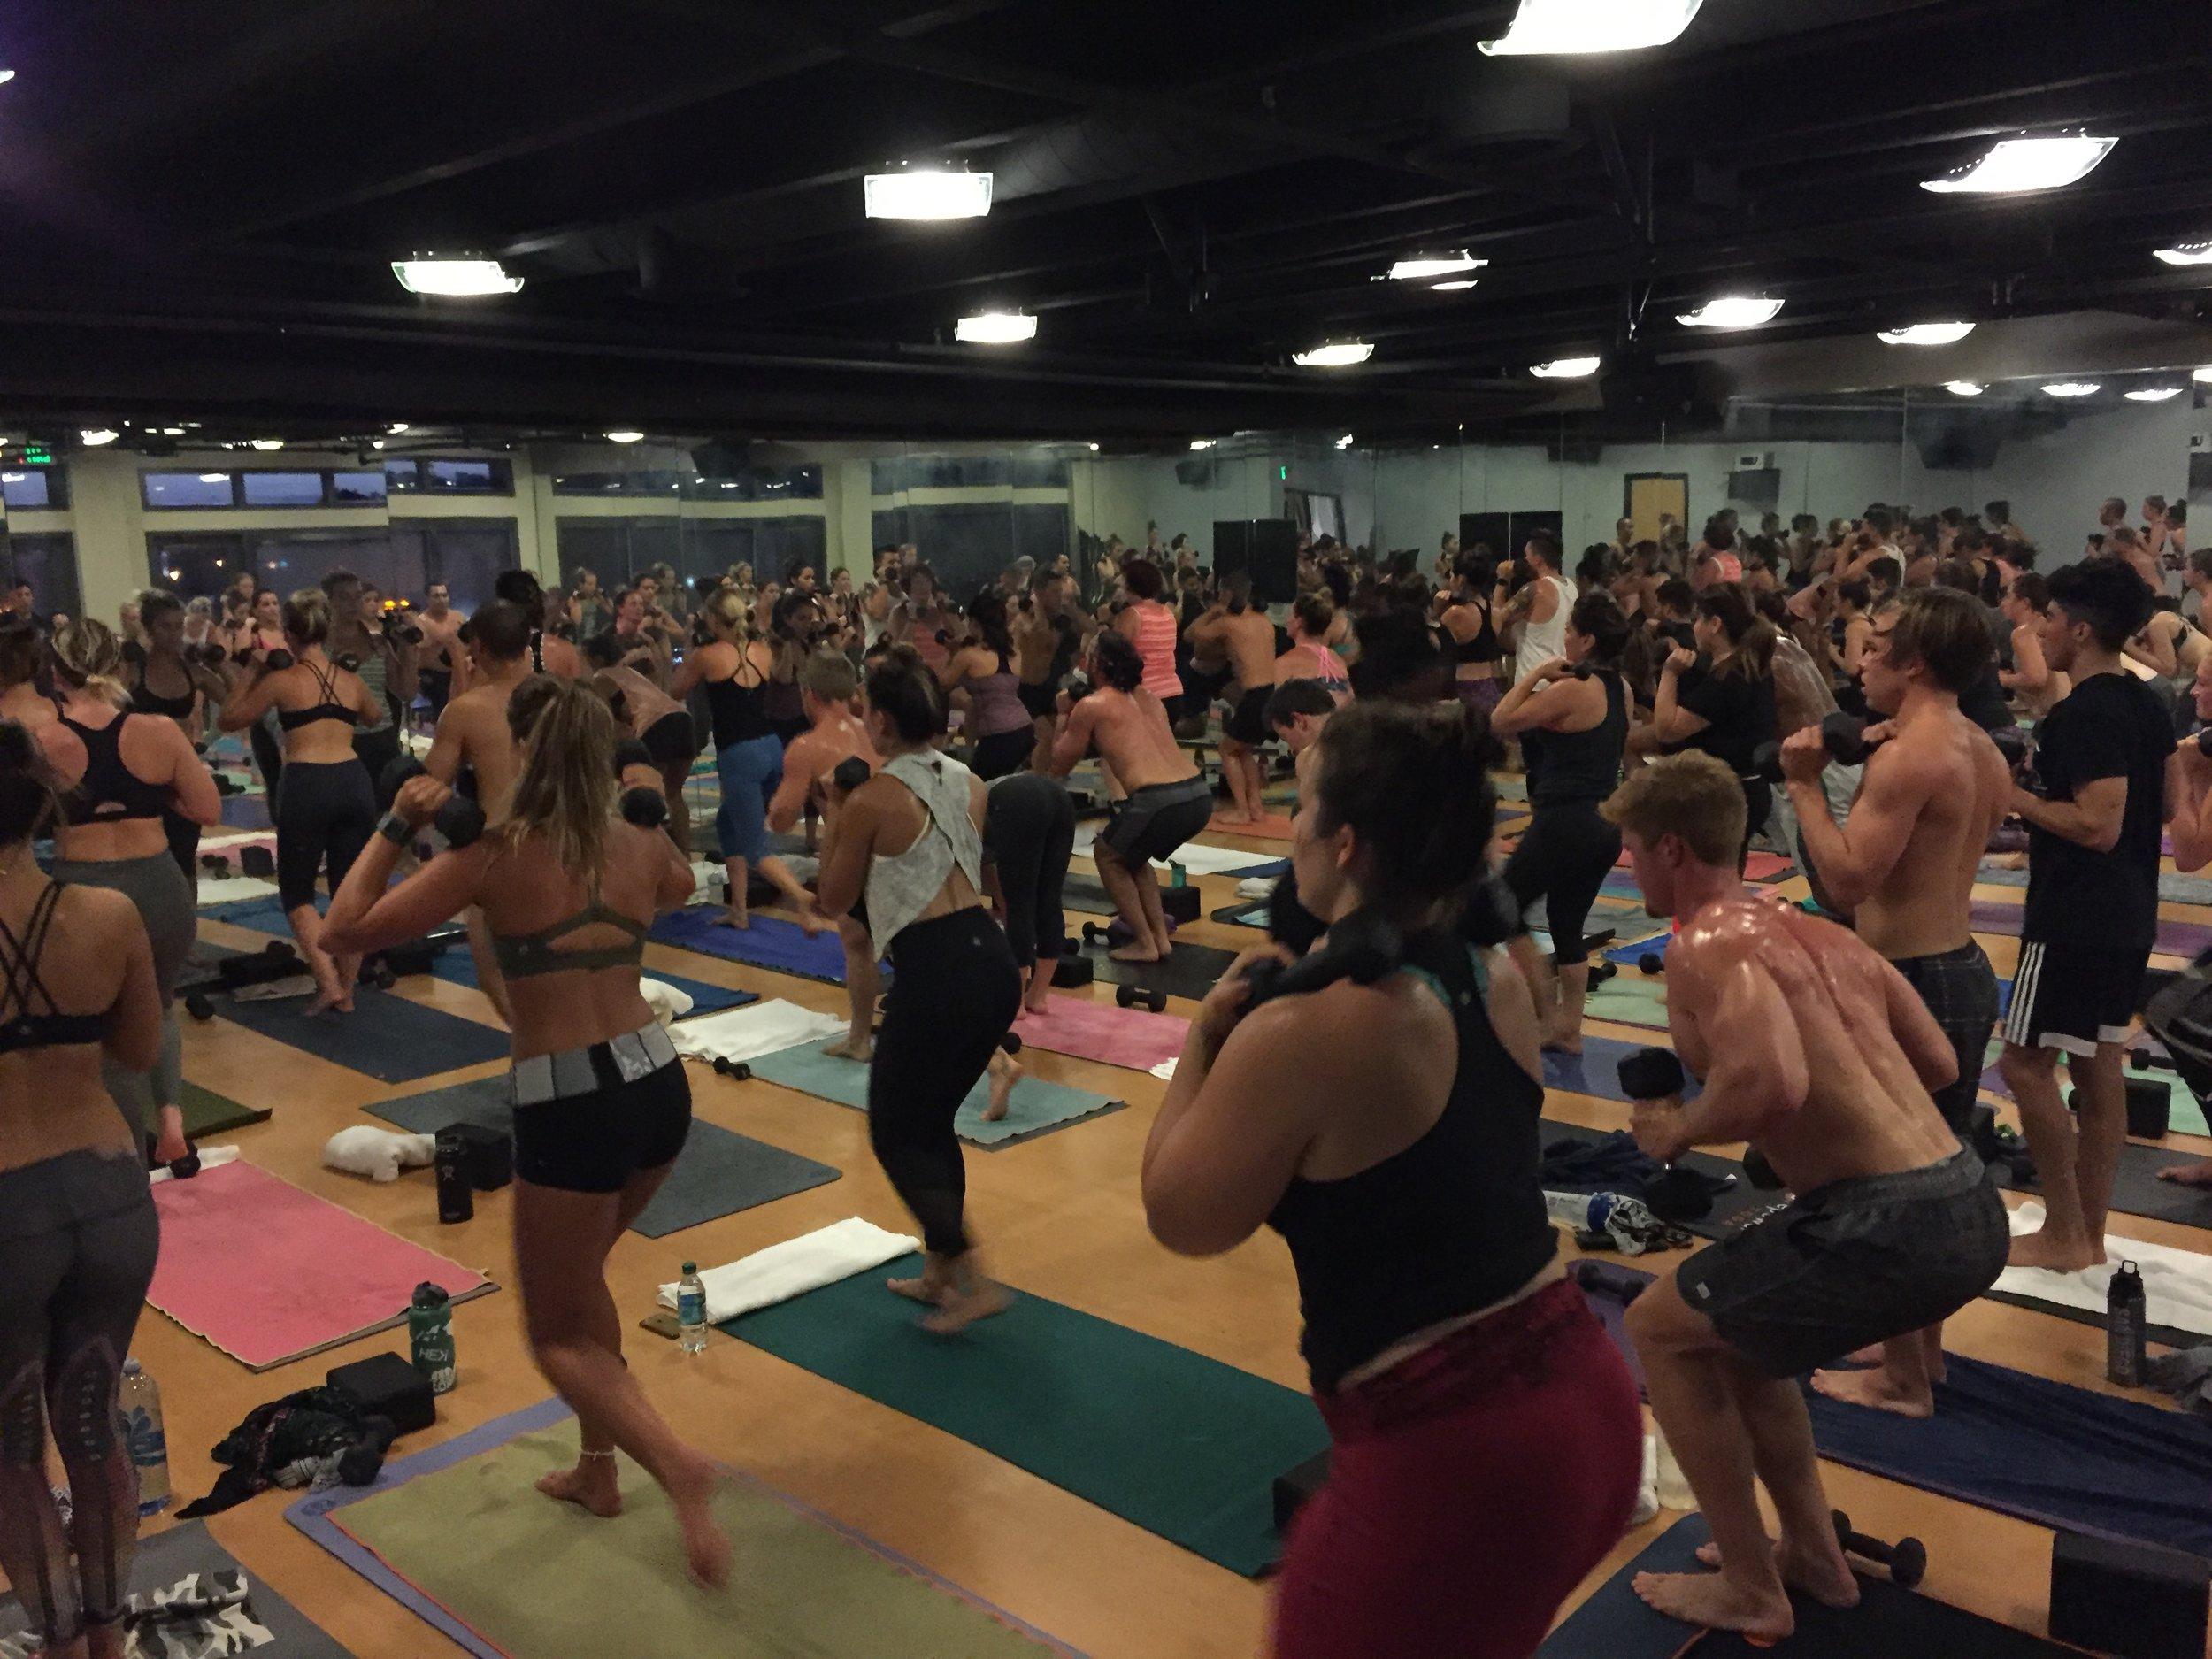 San Diego based yoga DJ, Justin Kanoya, spins beats at Corepower Yoga.